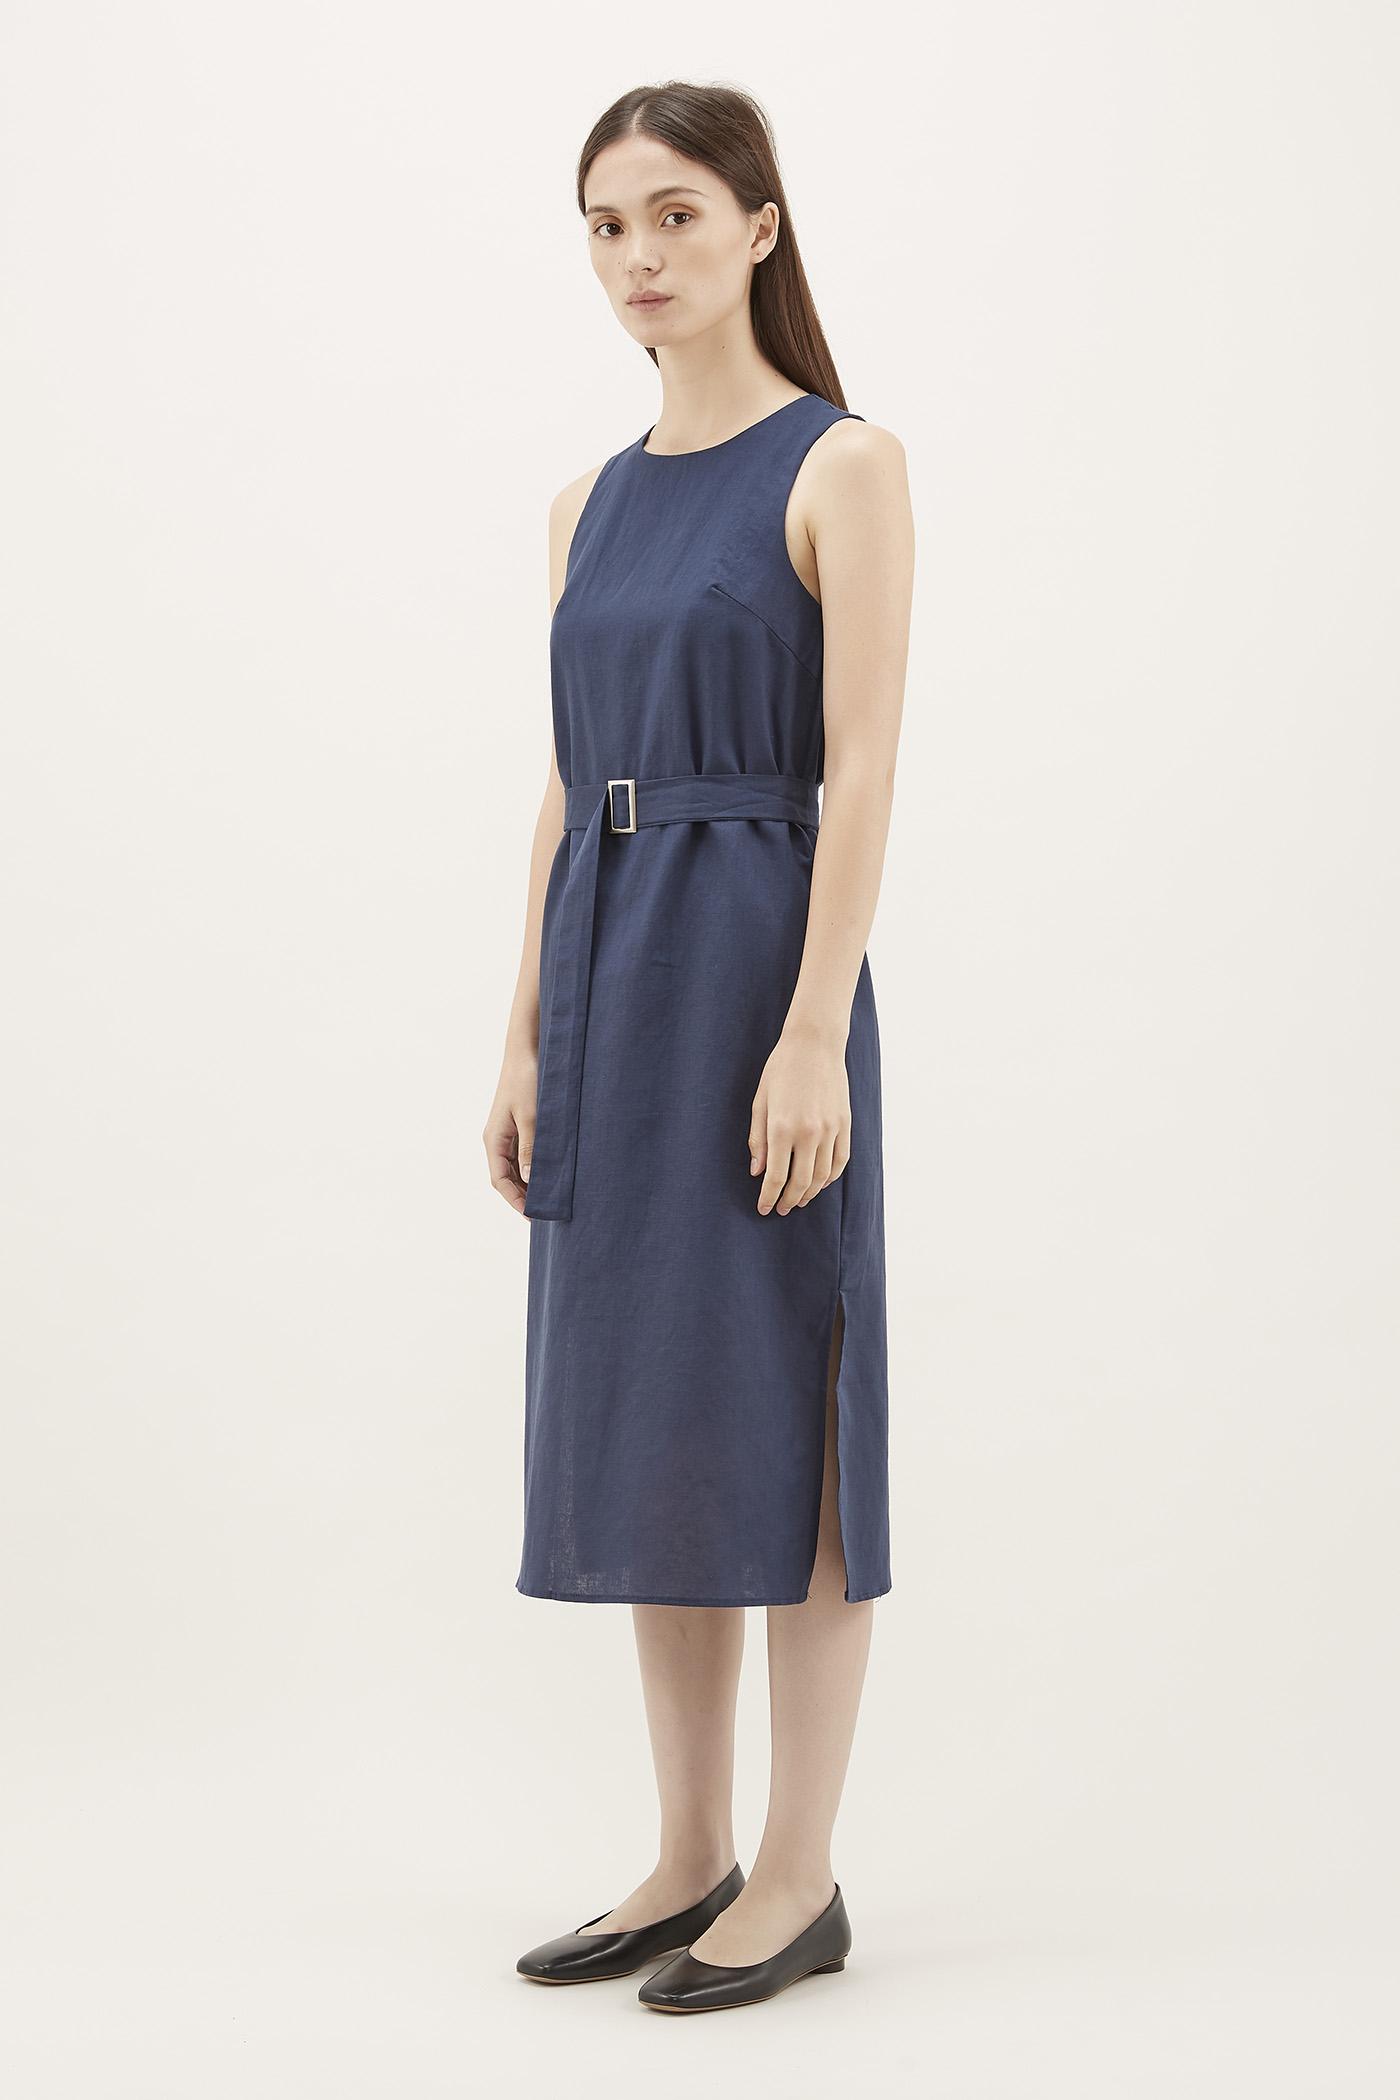 Danior Belted Dress